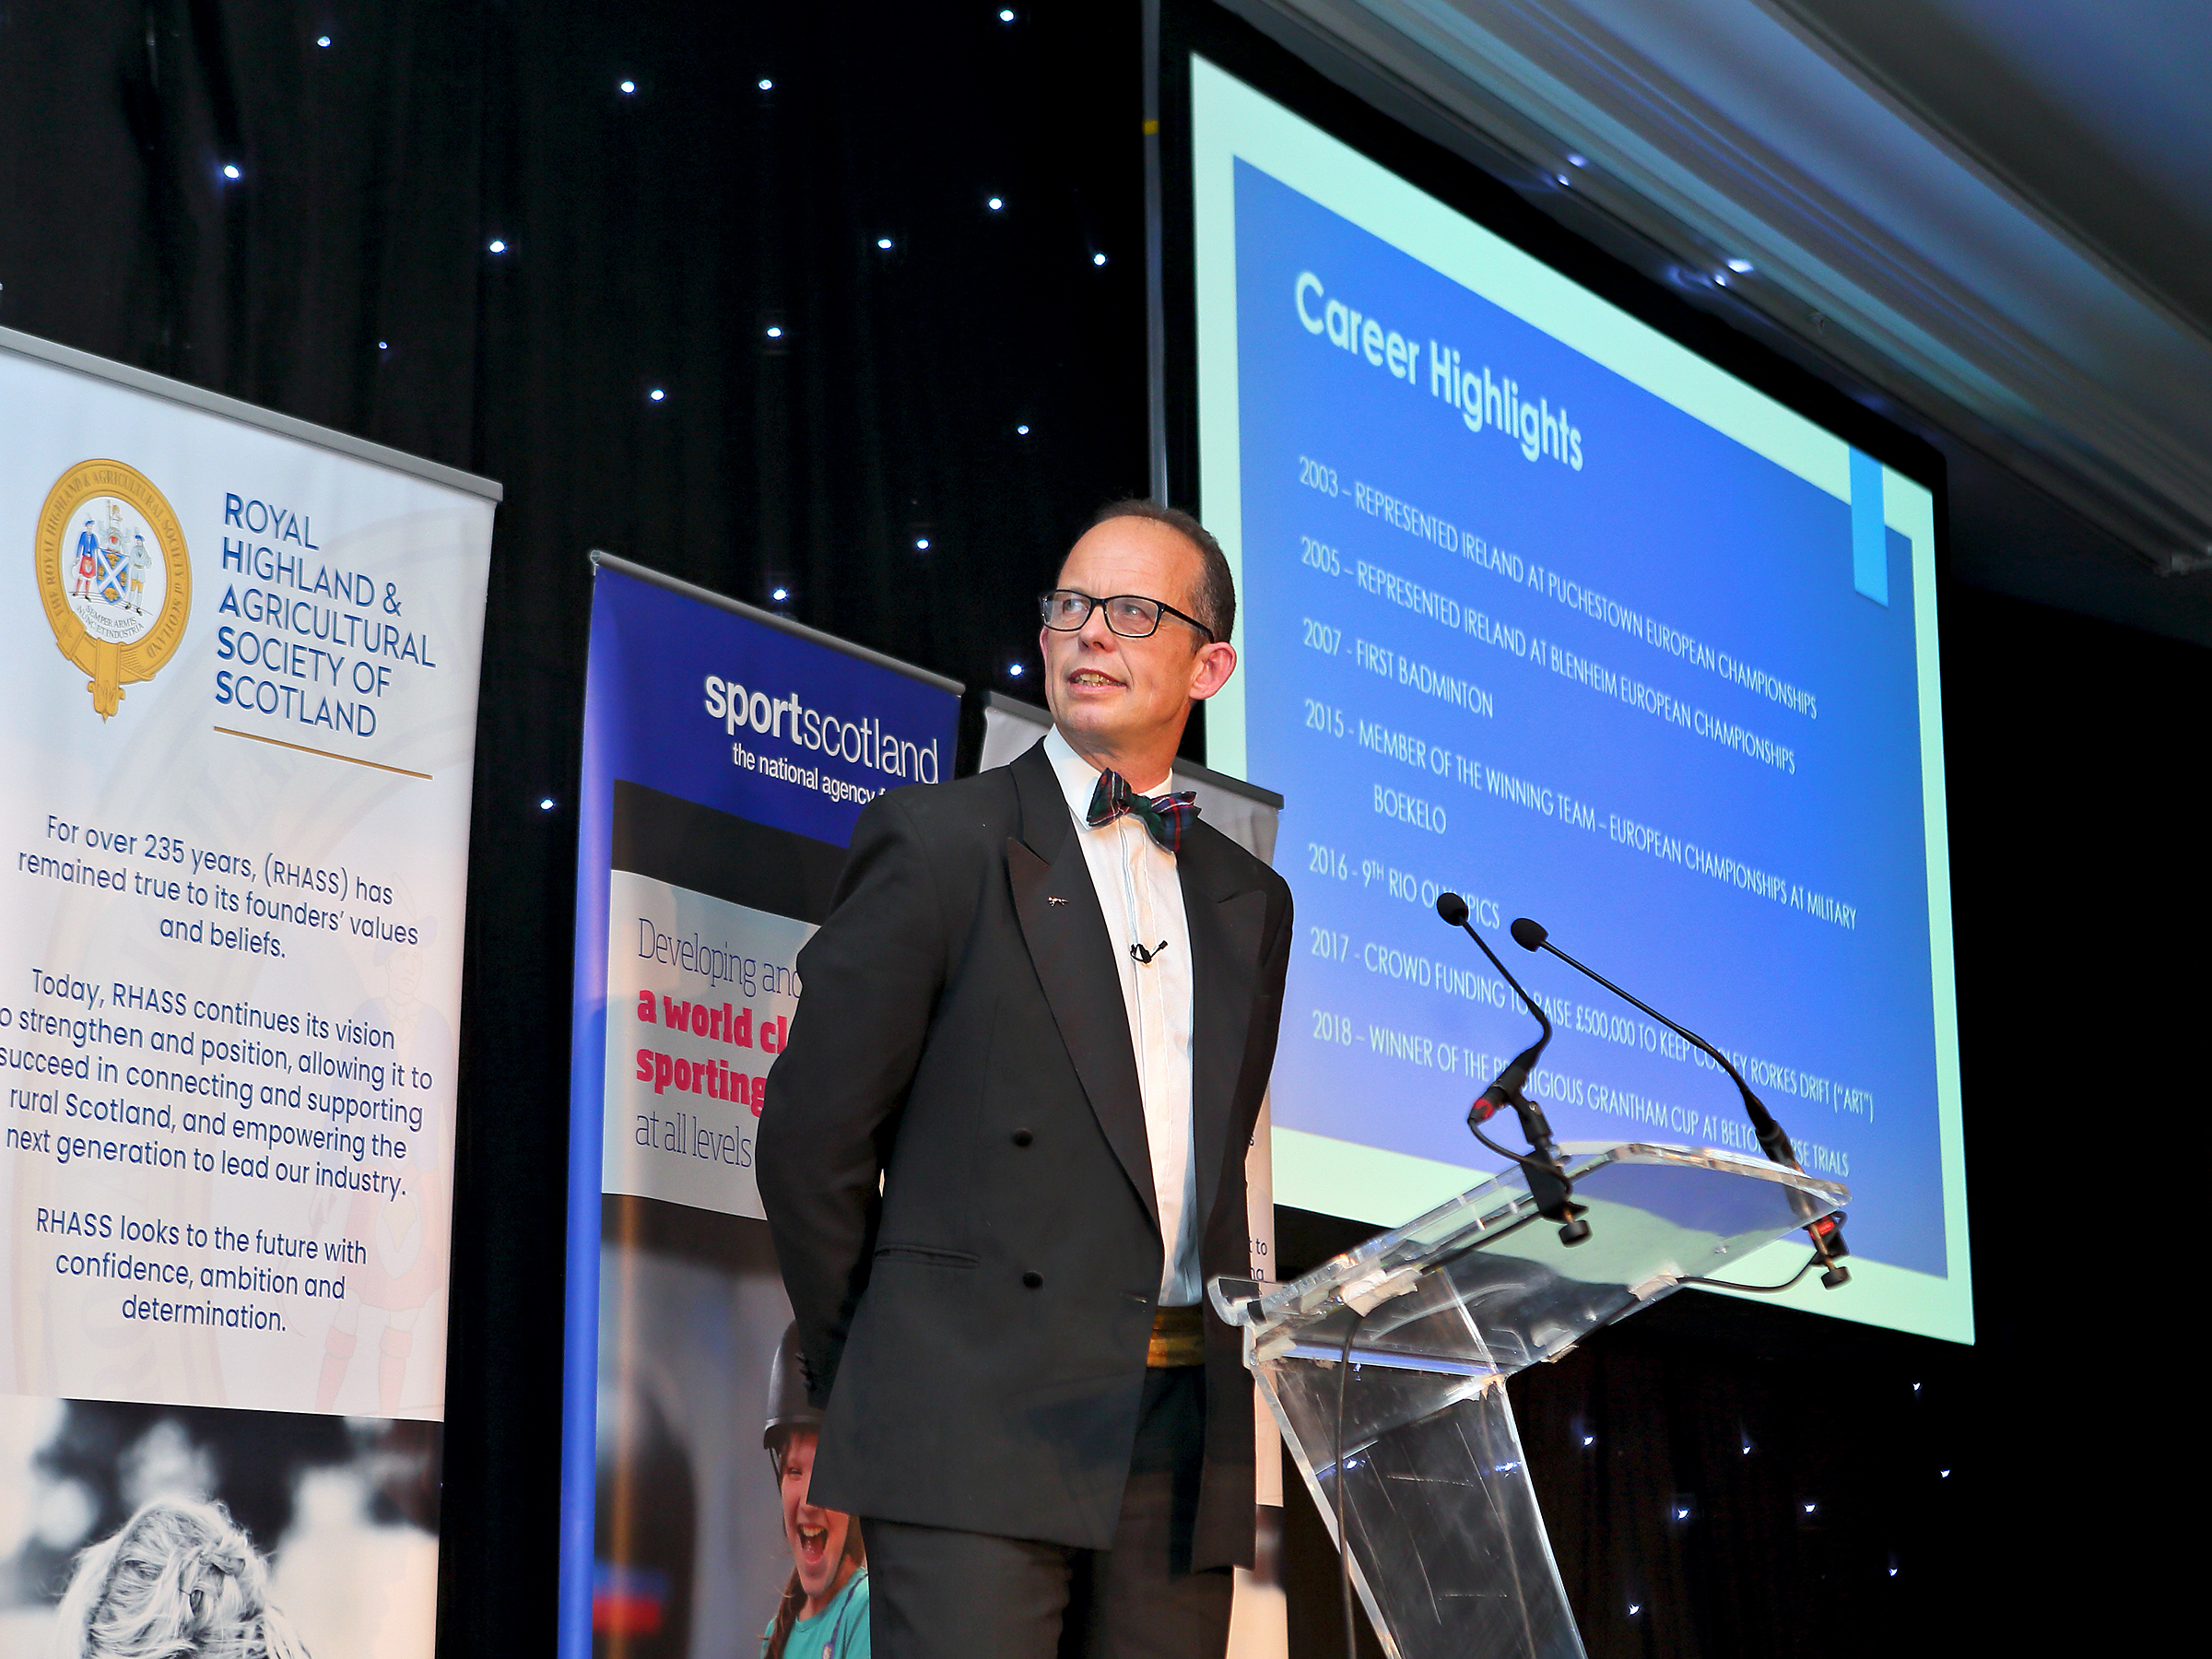 Jonty Evans speaking at the Scottish National Equestrian Awards